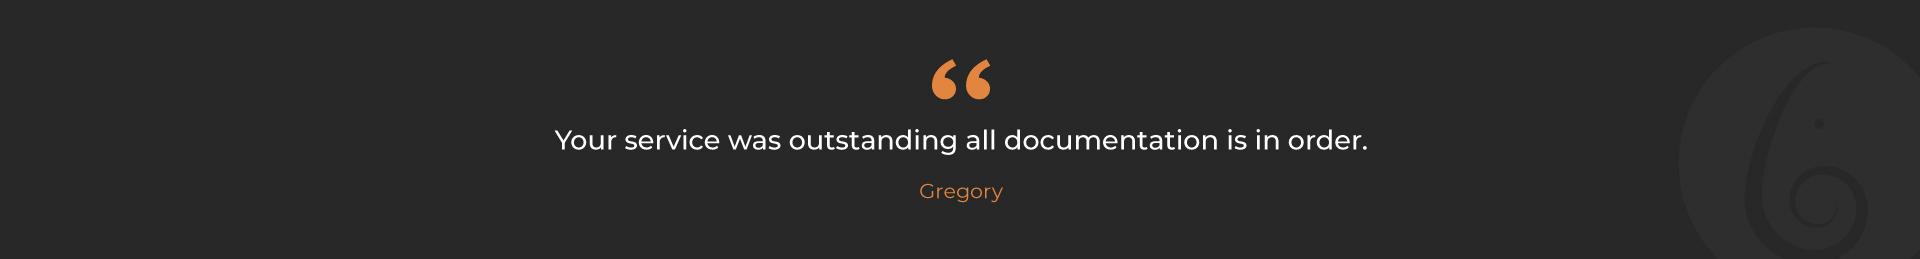 Gregory-Testmonial